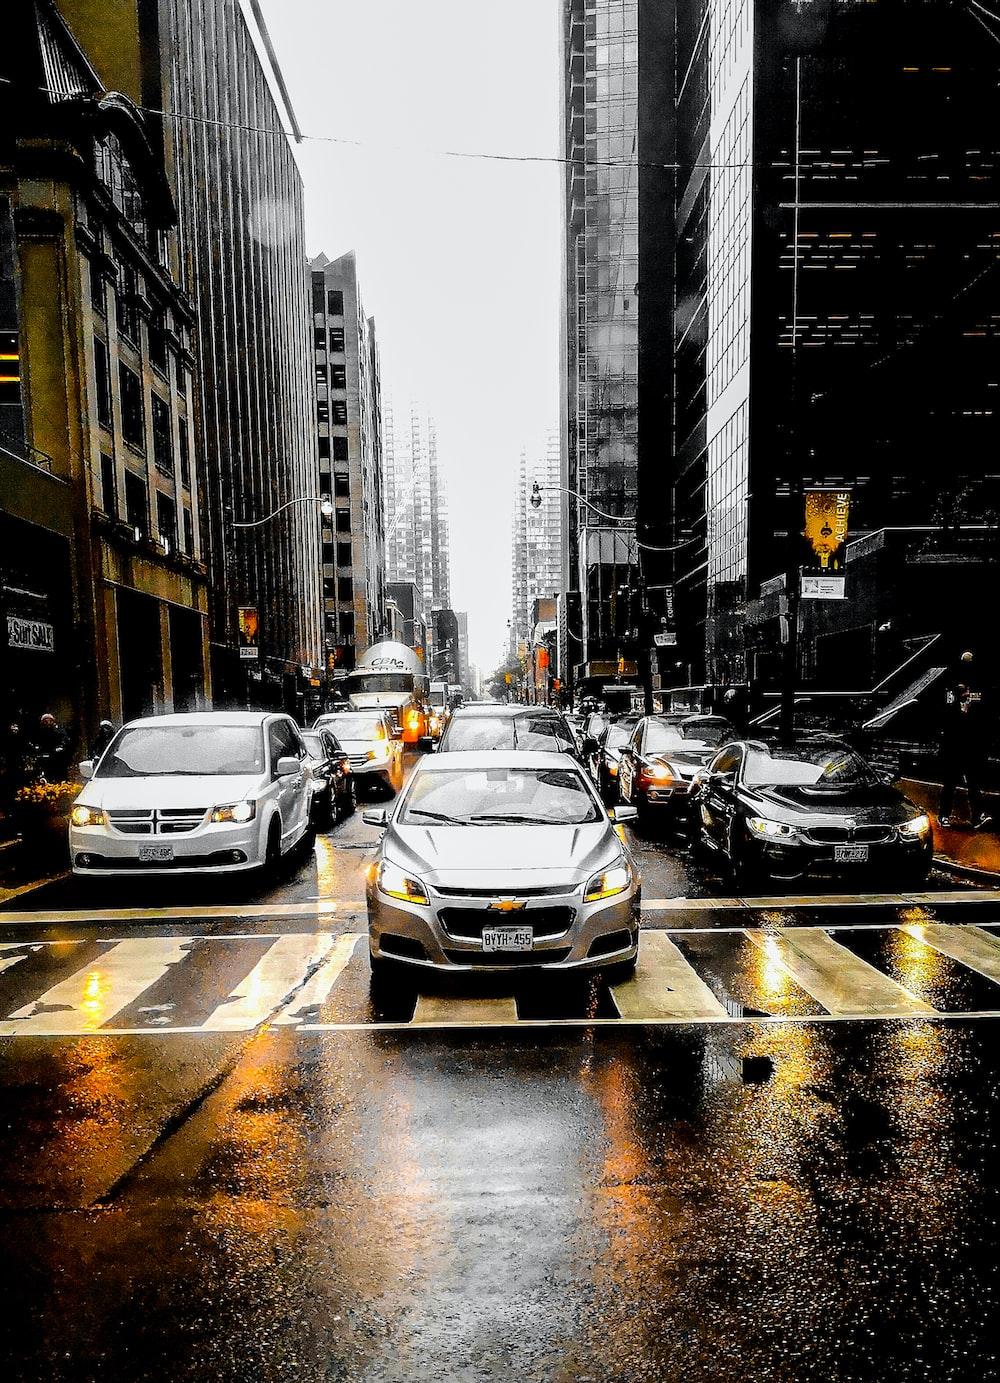 urban photo of cars in traffic